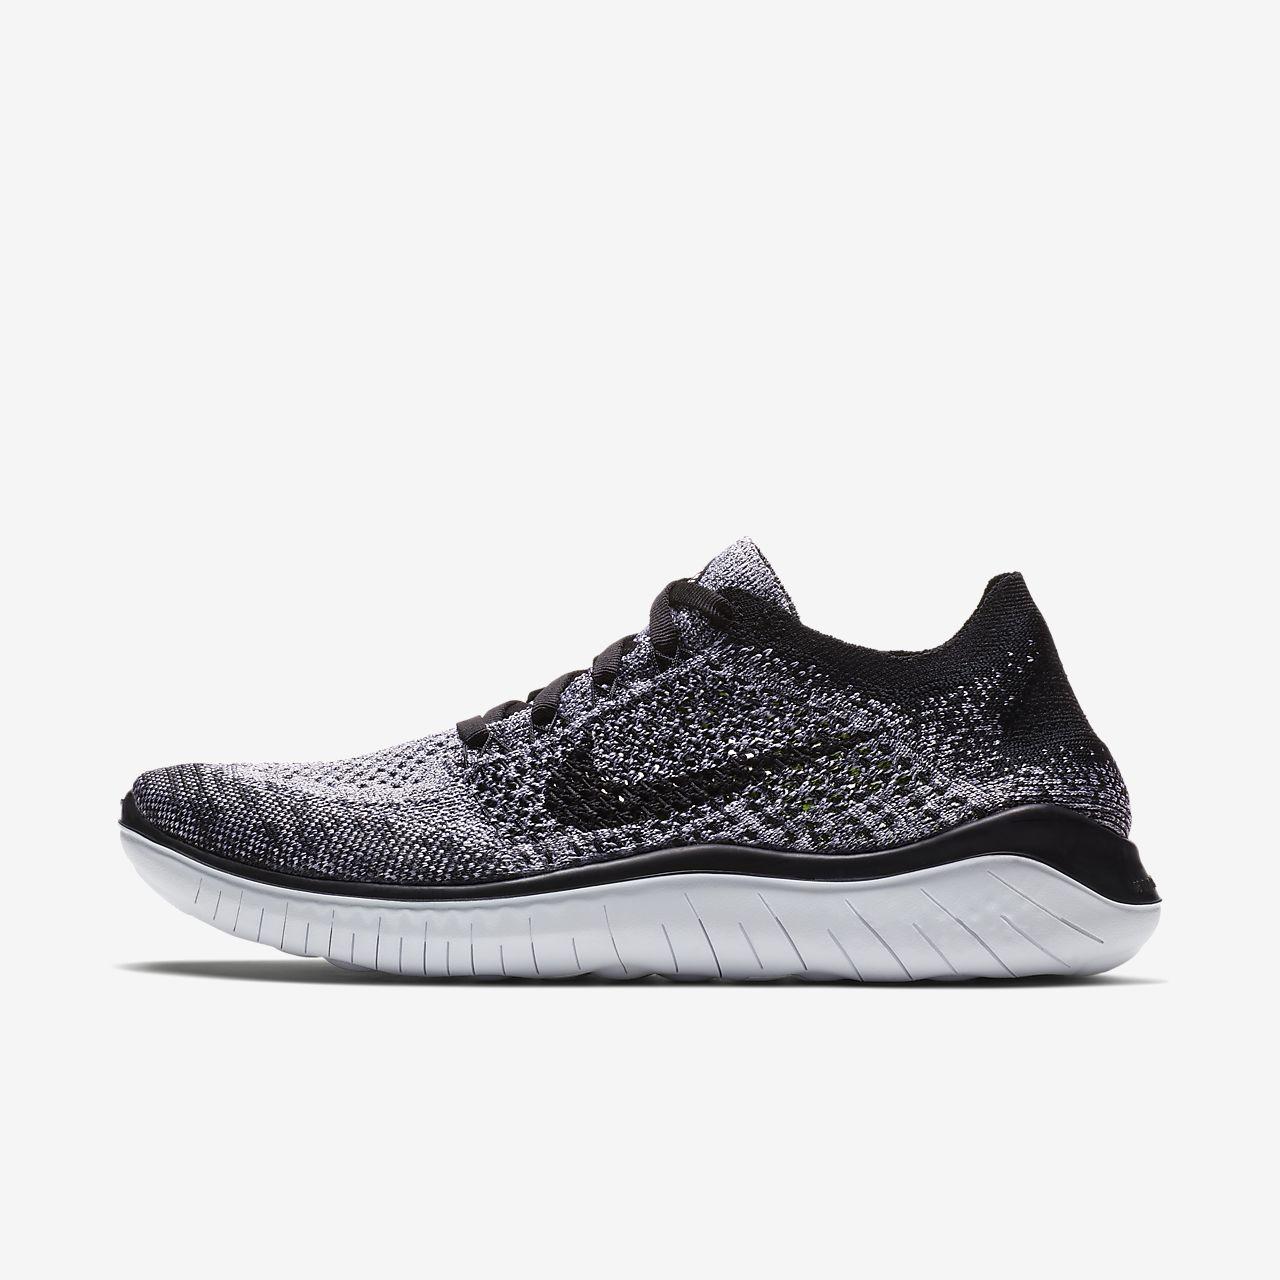 Nike - Free RN Femmes chaussure de course (blanc/noir) - EU 40,5 - US 9